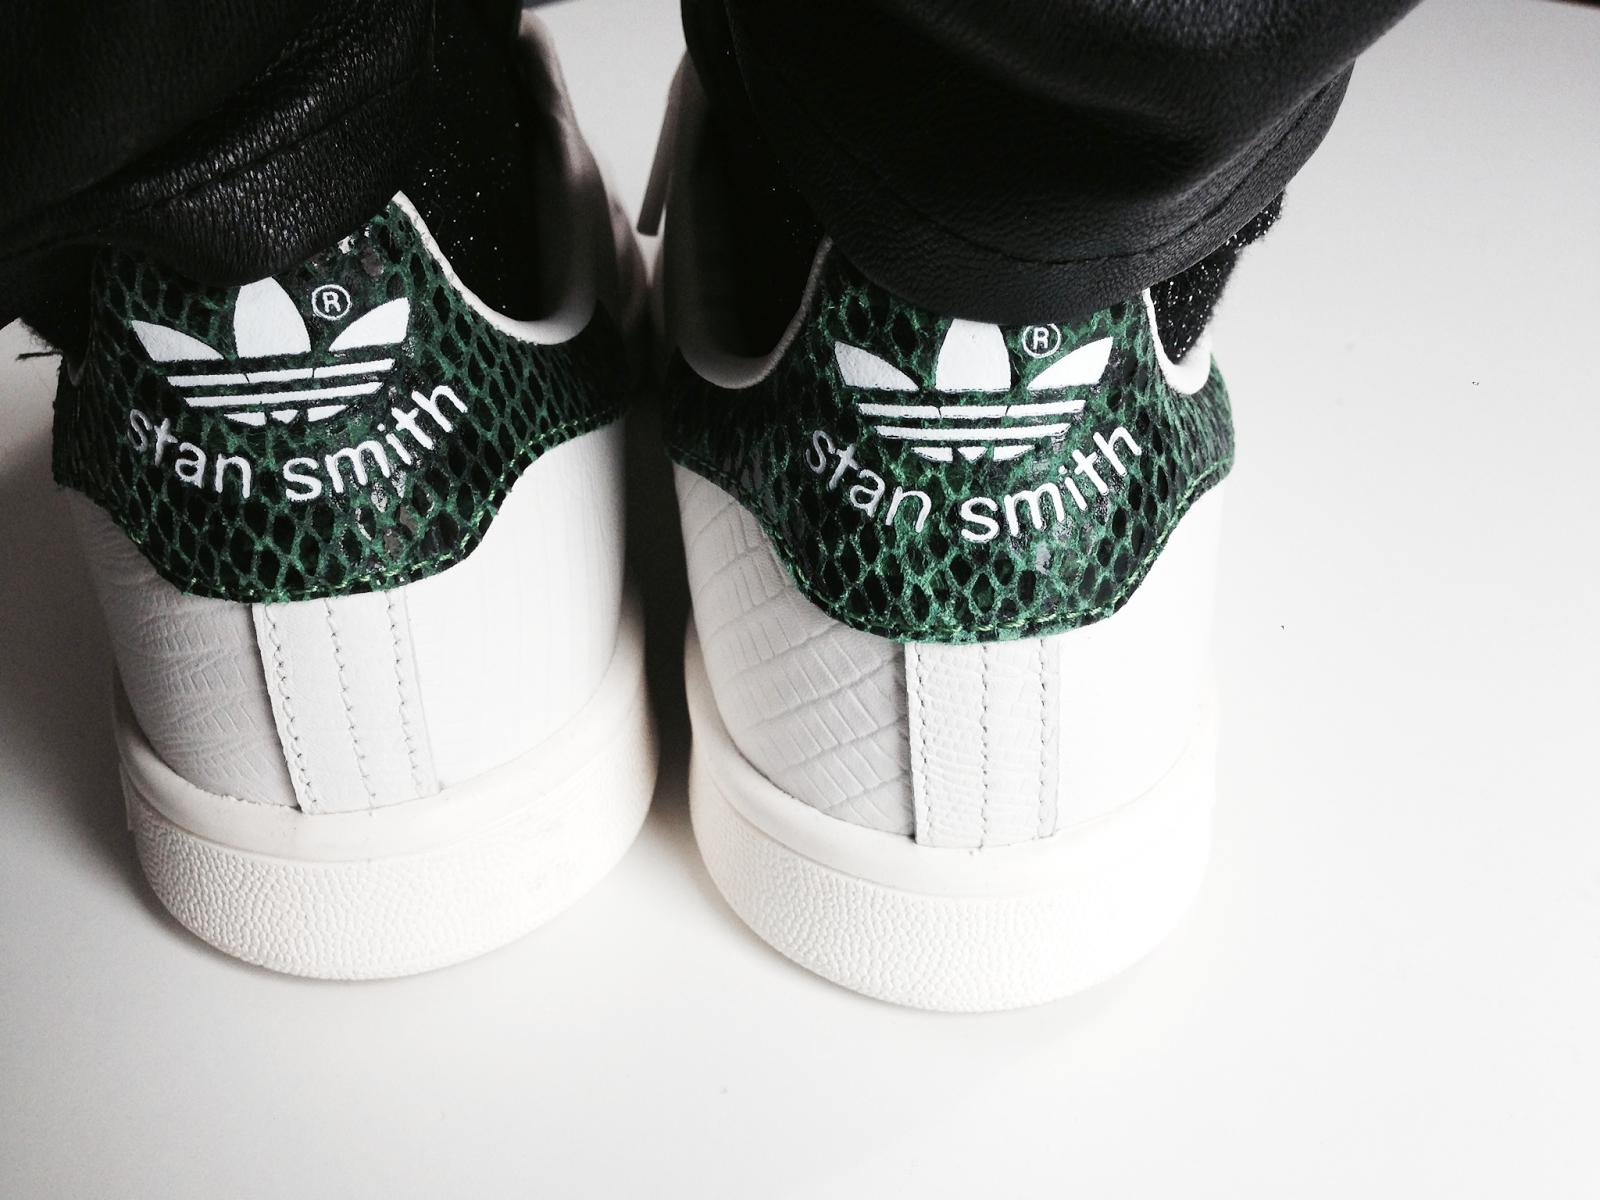 low priced 2de99 75fa7 Chaussures Adidas Stan Smith Cuir Python Pour Femme Blanc Vert